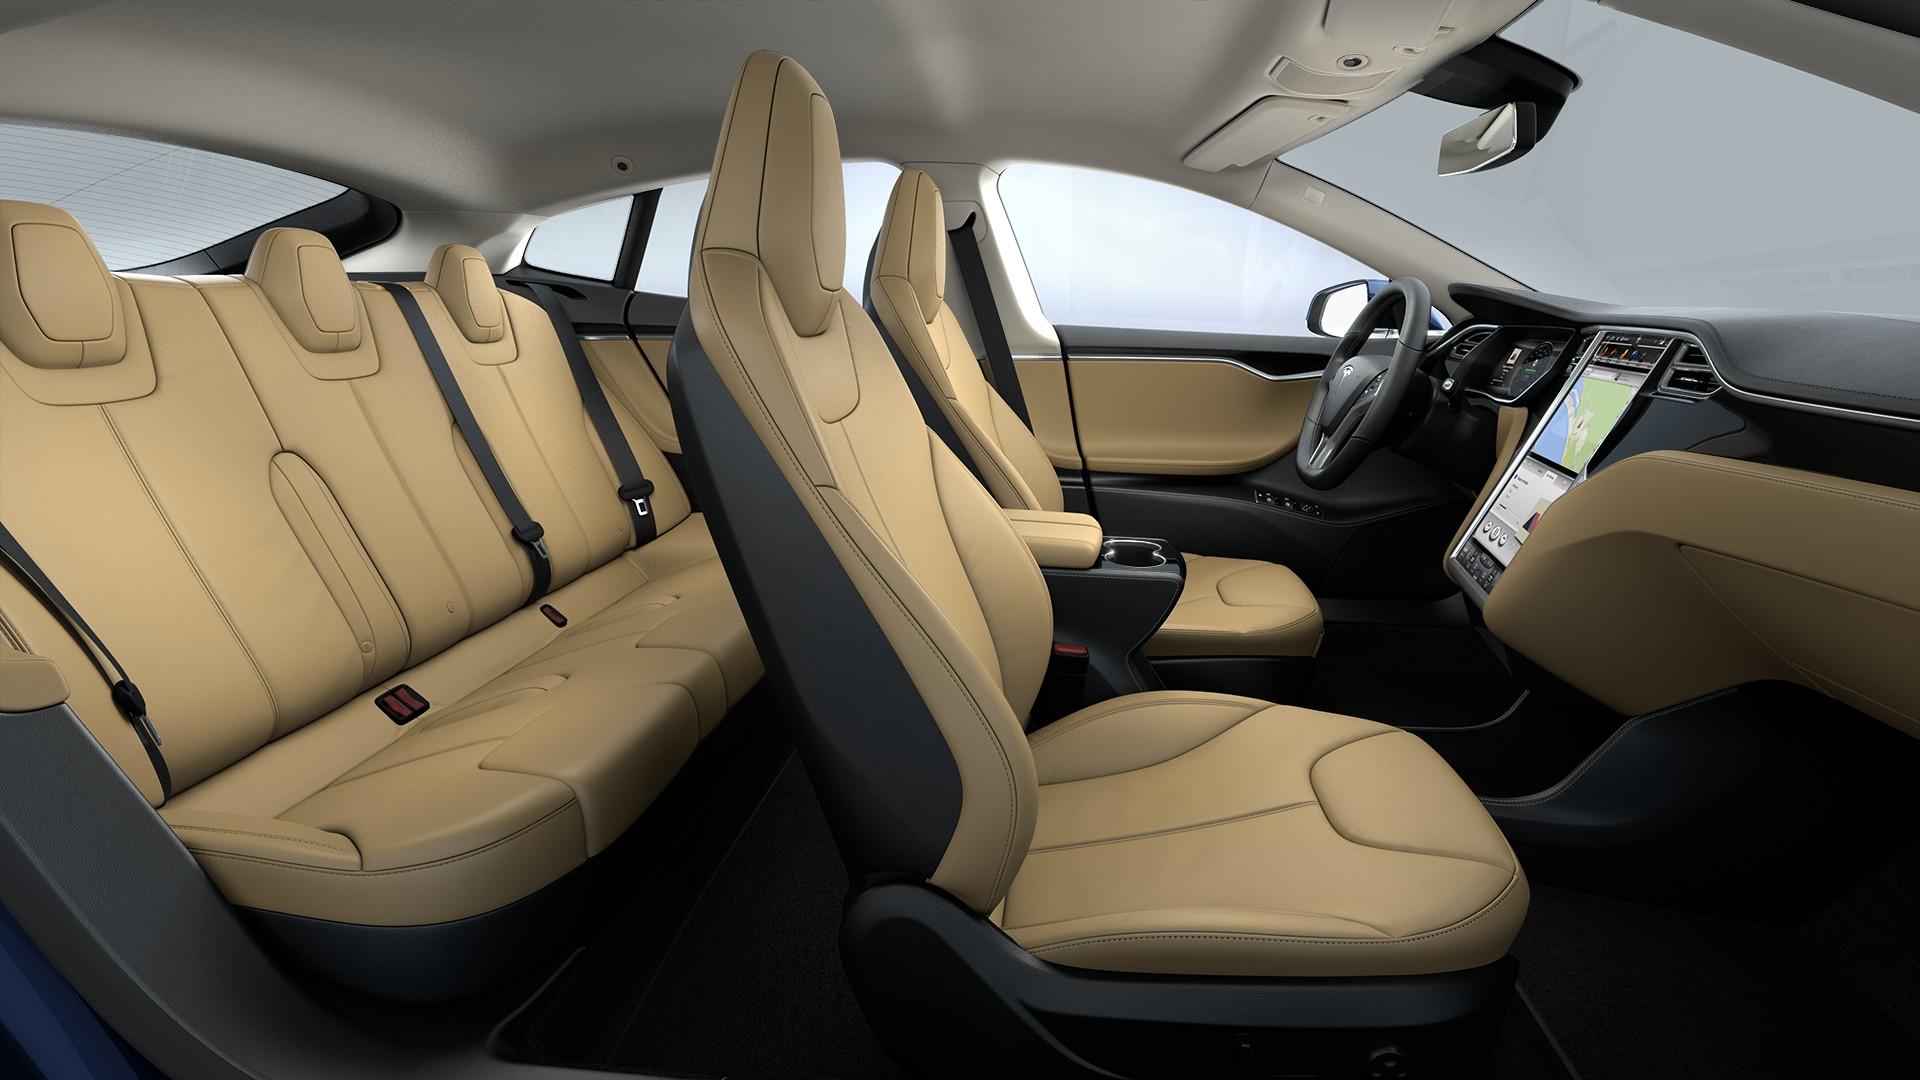 Interieur Tan Leather Seats Piano Black Decor Standard Textile Headliner